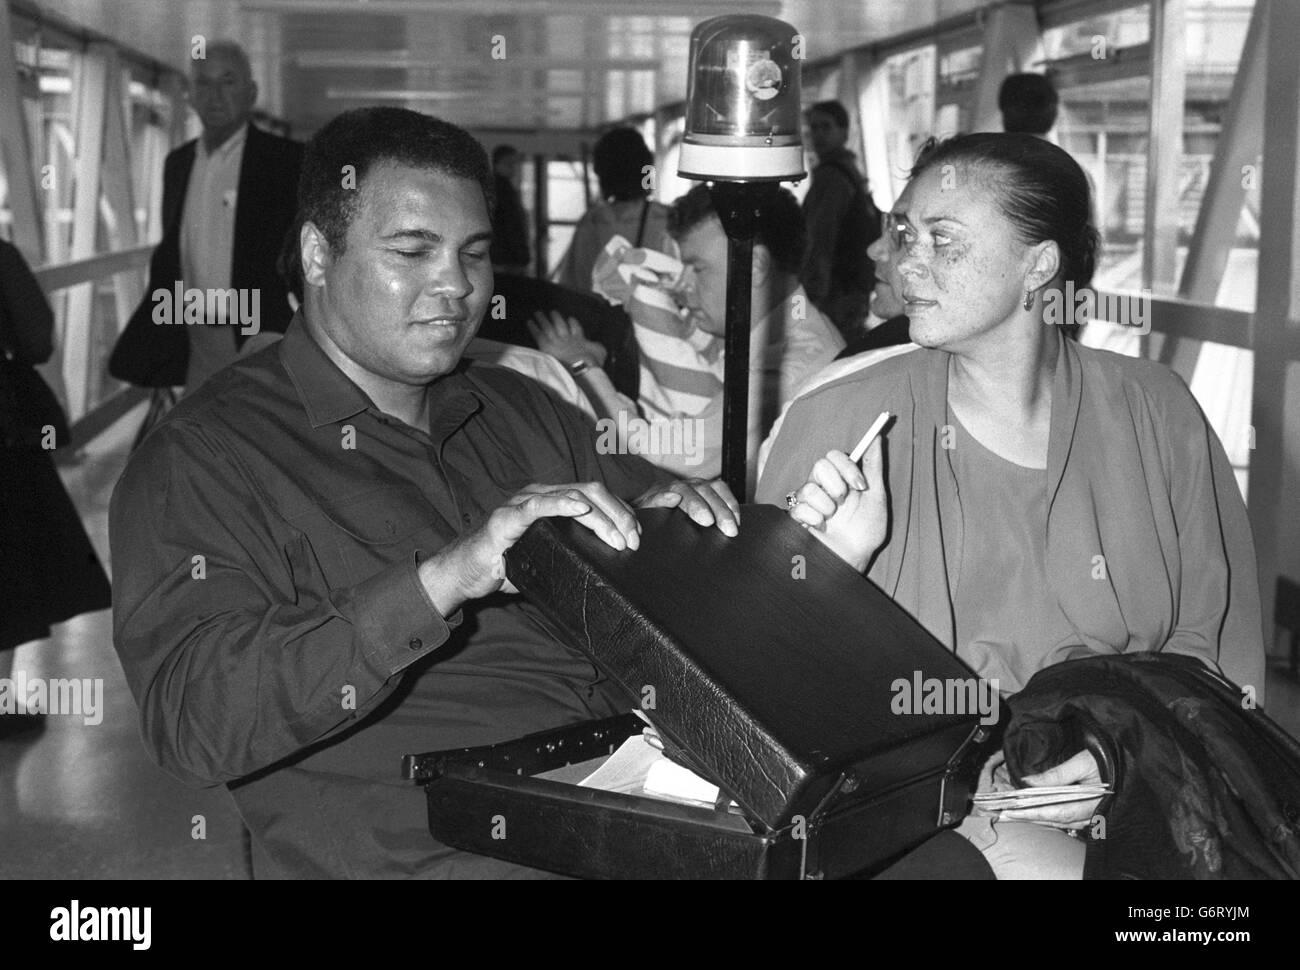 Boxing - Muhammad Ali - Heathrow Airport - Stock Image